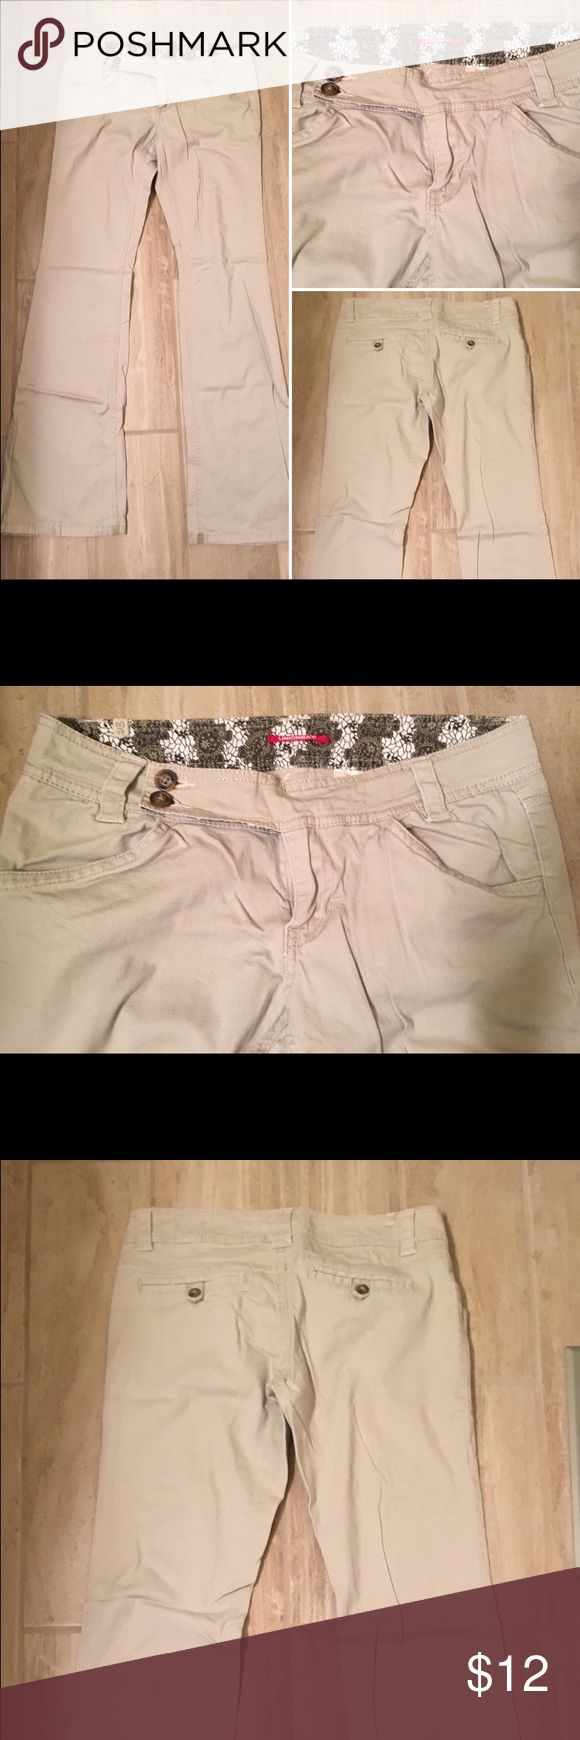 Bootcut khaki pants for juniors